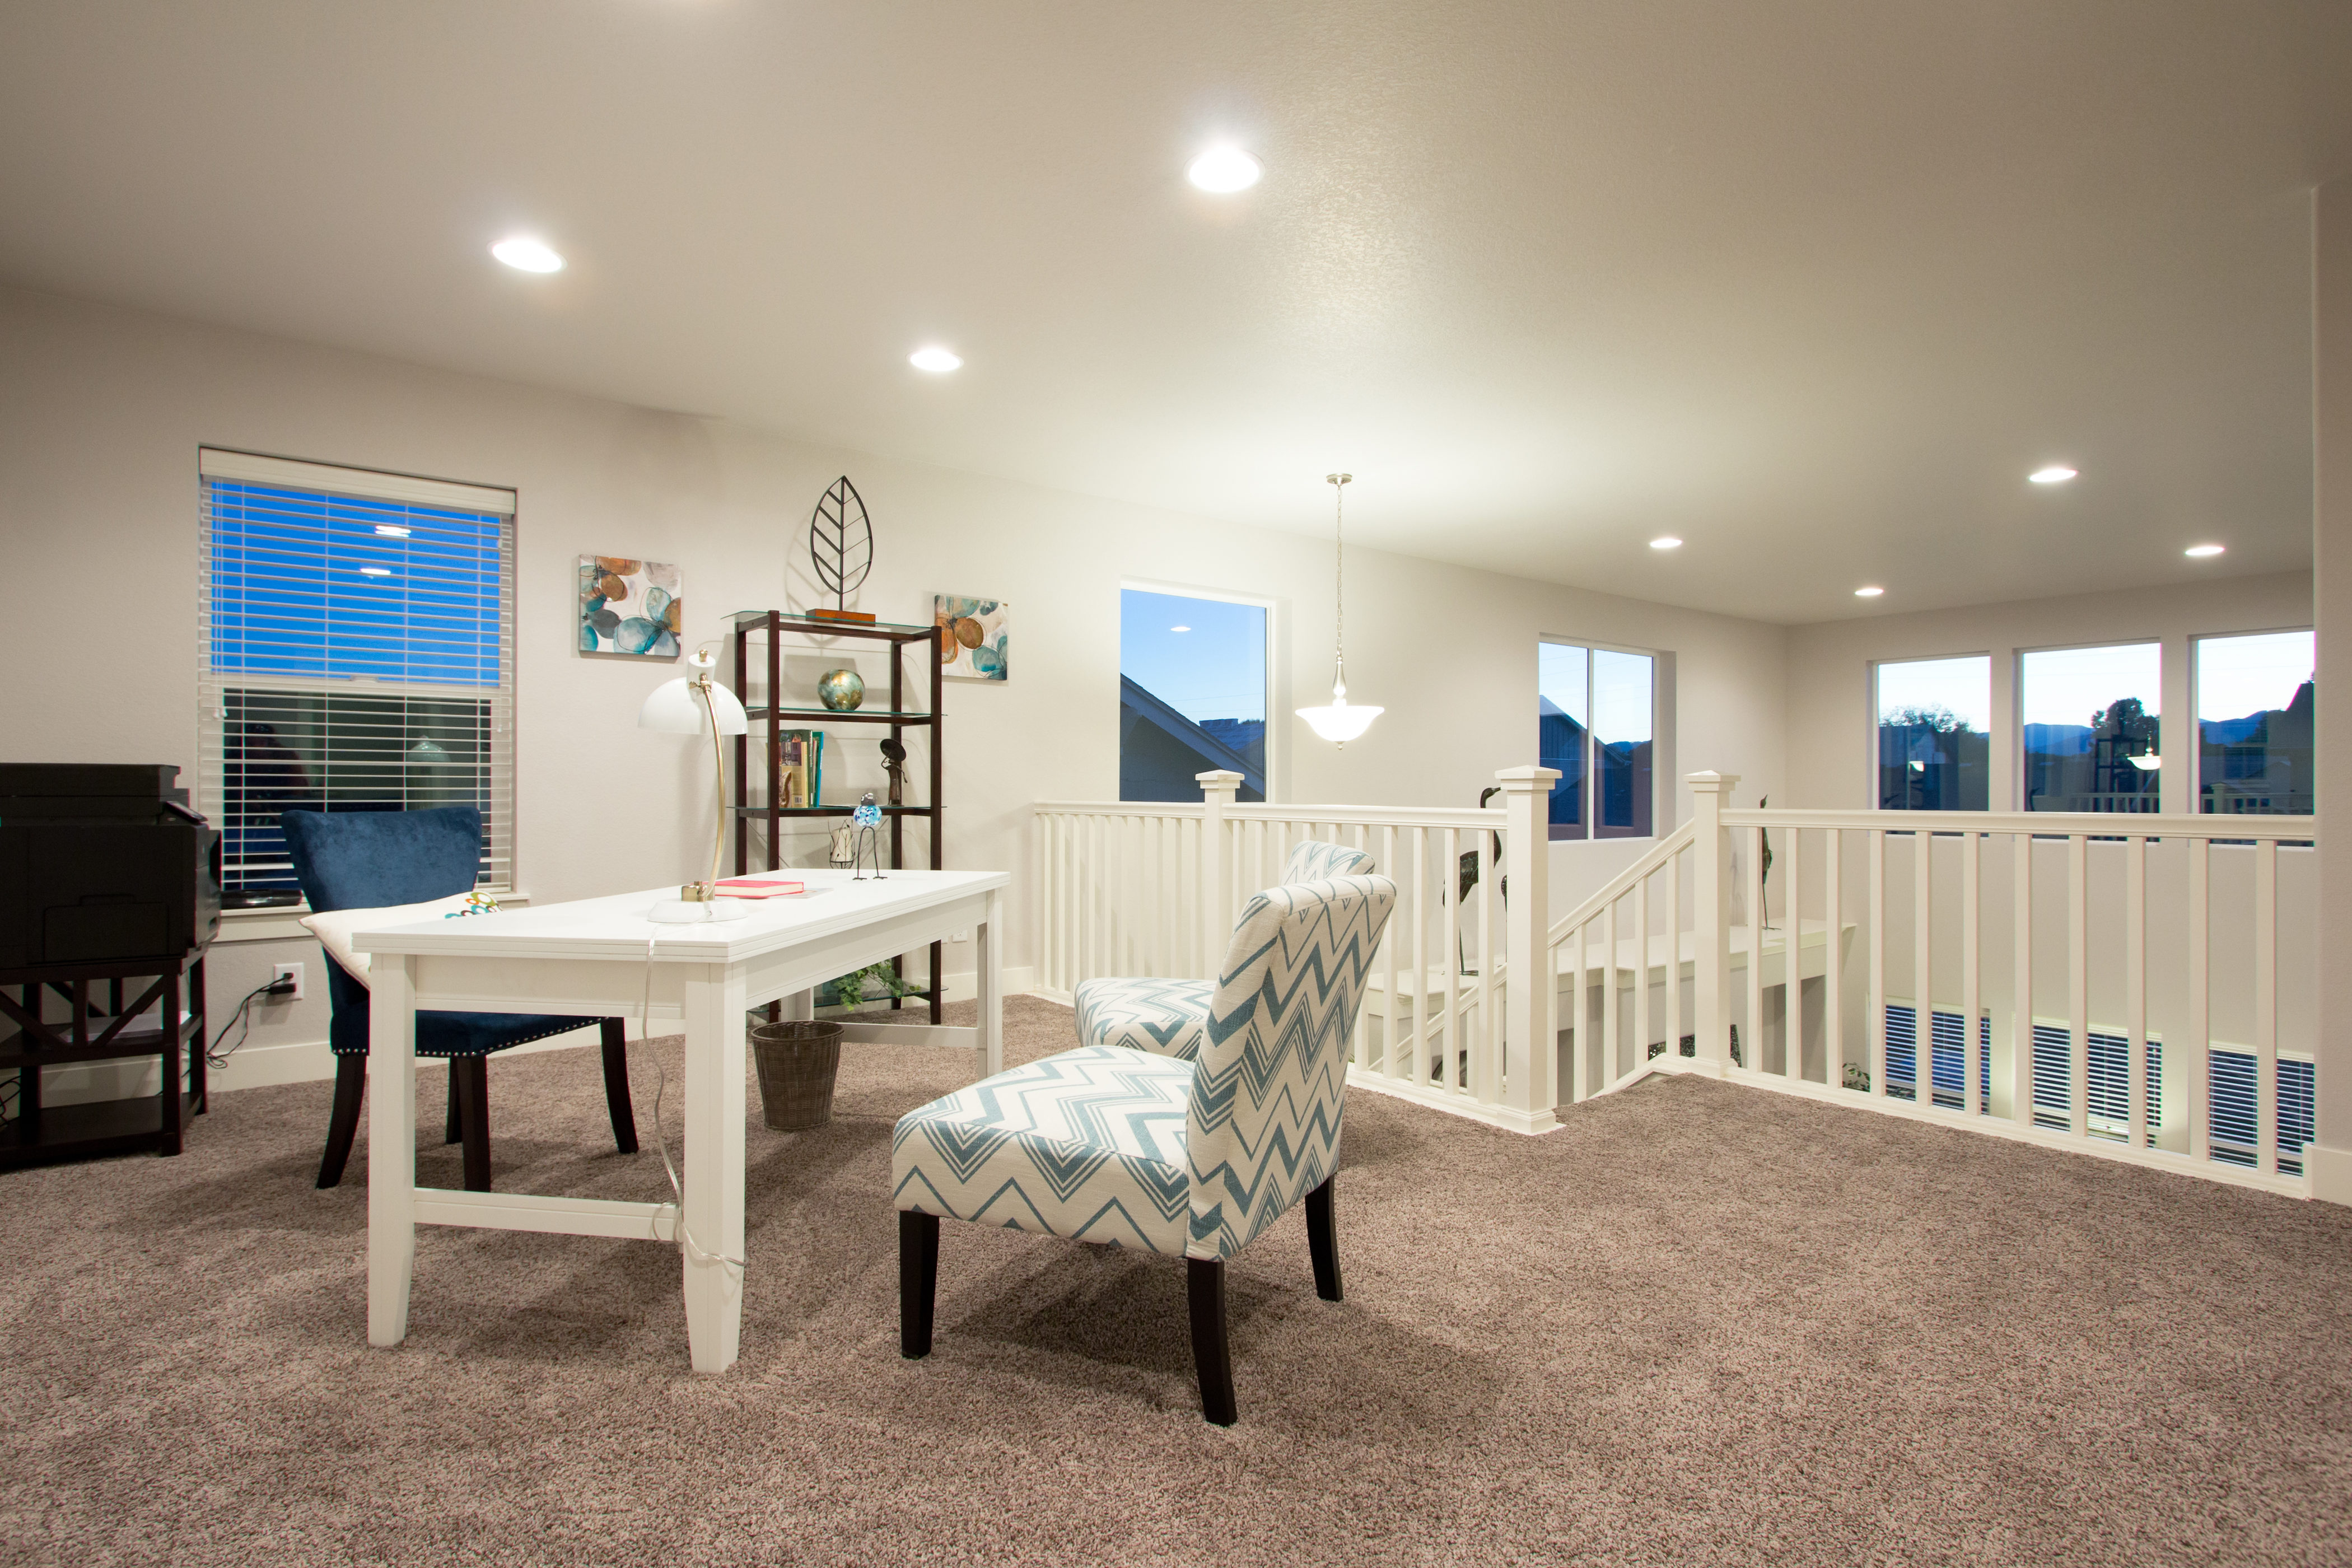 15-montrose-fort_collins-loft-new_home_community